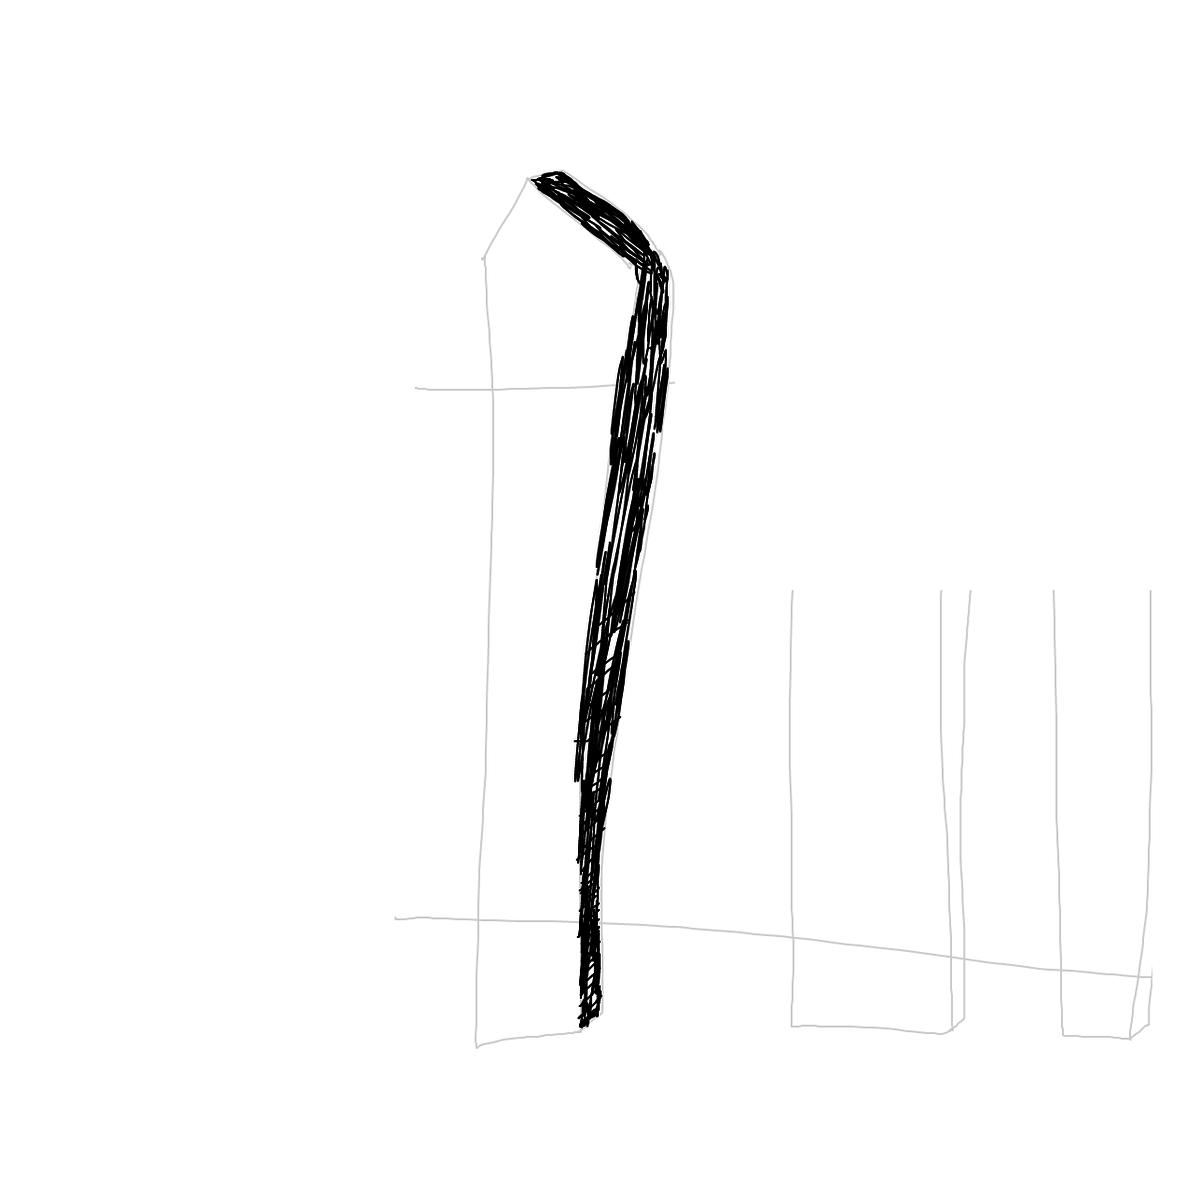 BAAAM drawing#16130 lat:52.4752540588378900lng: 13.4059133529663090